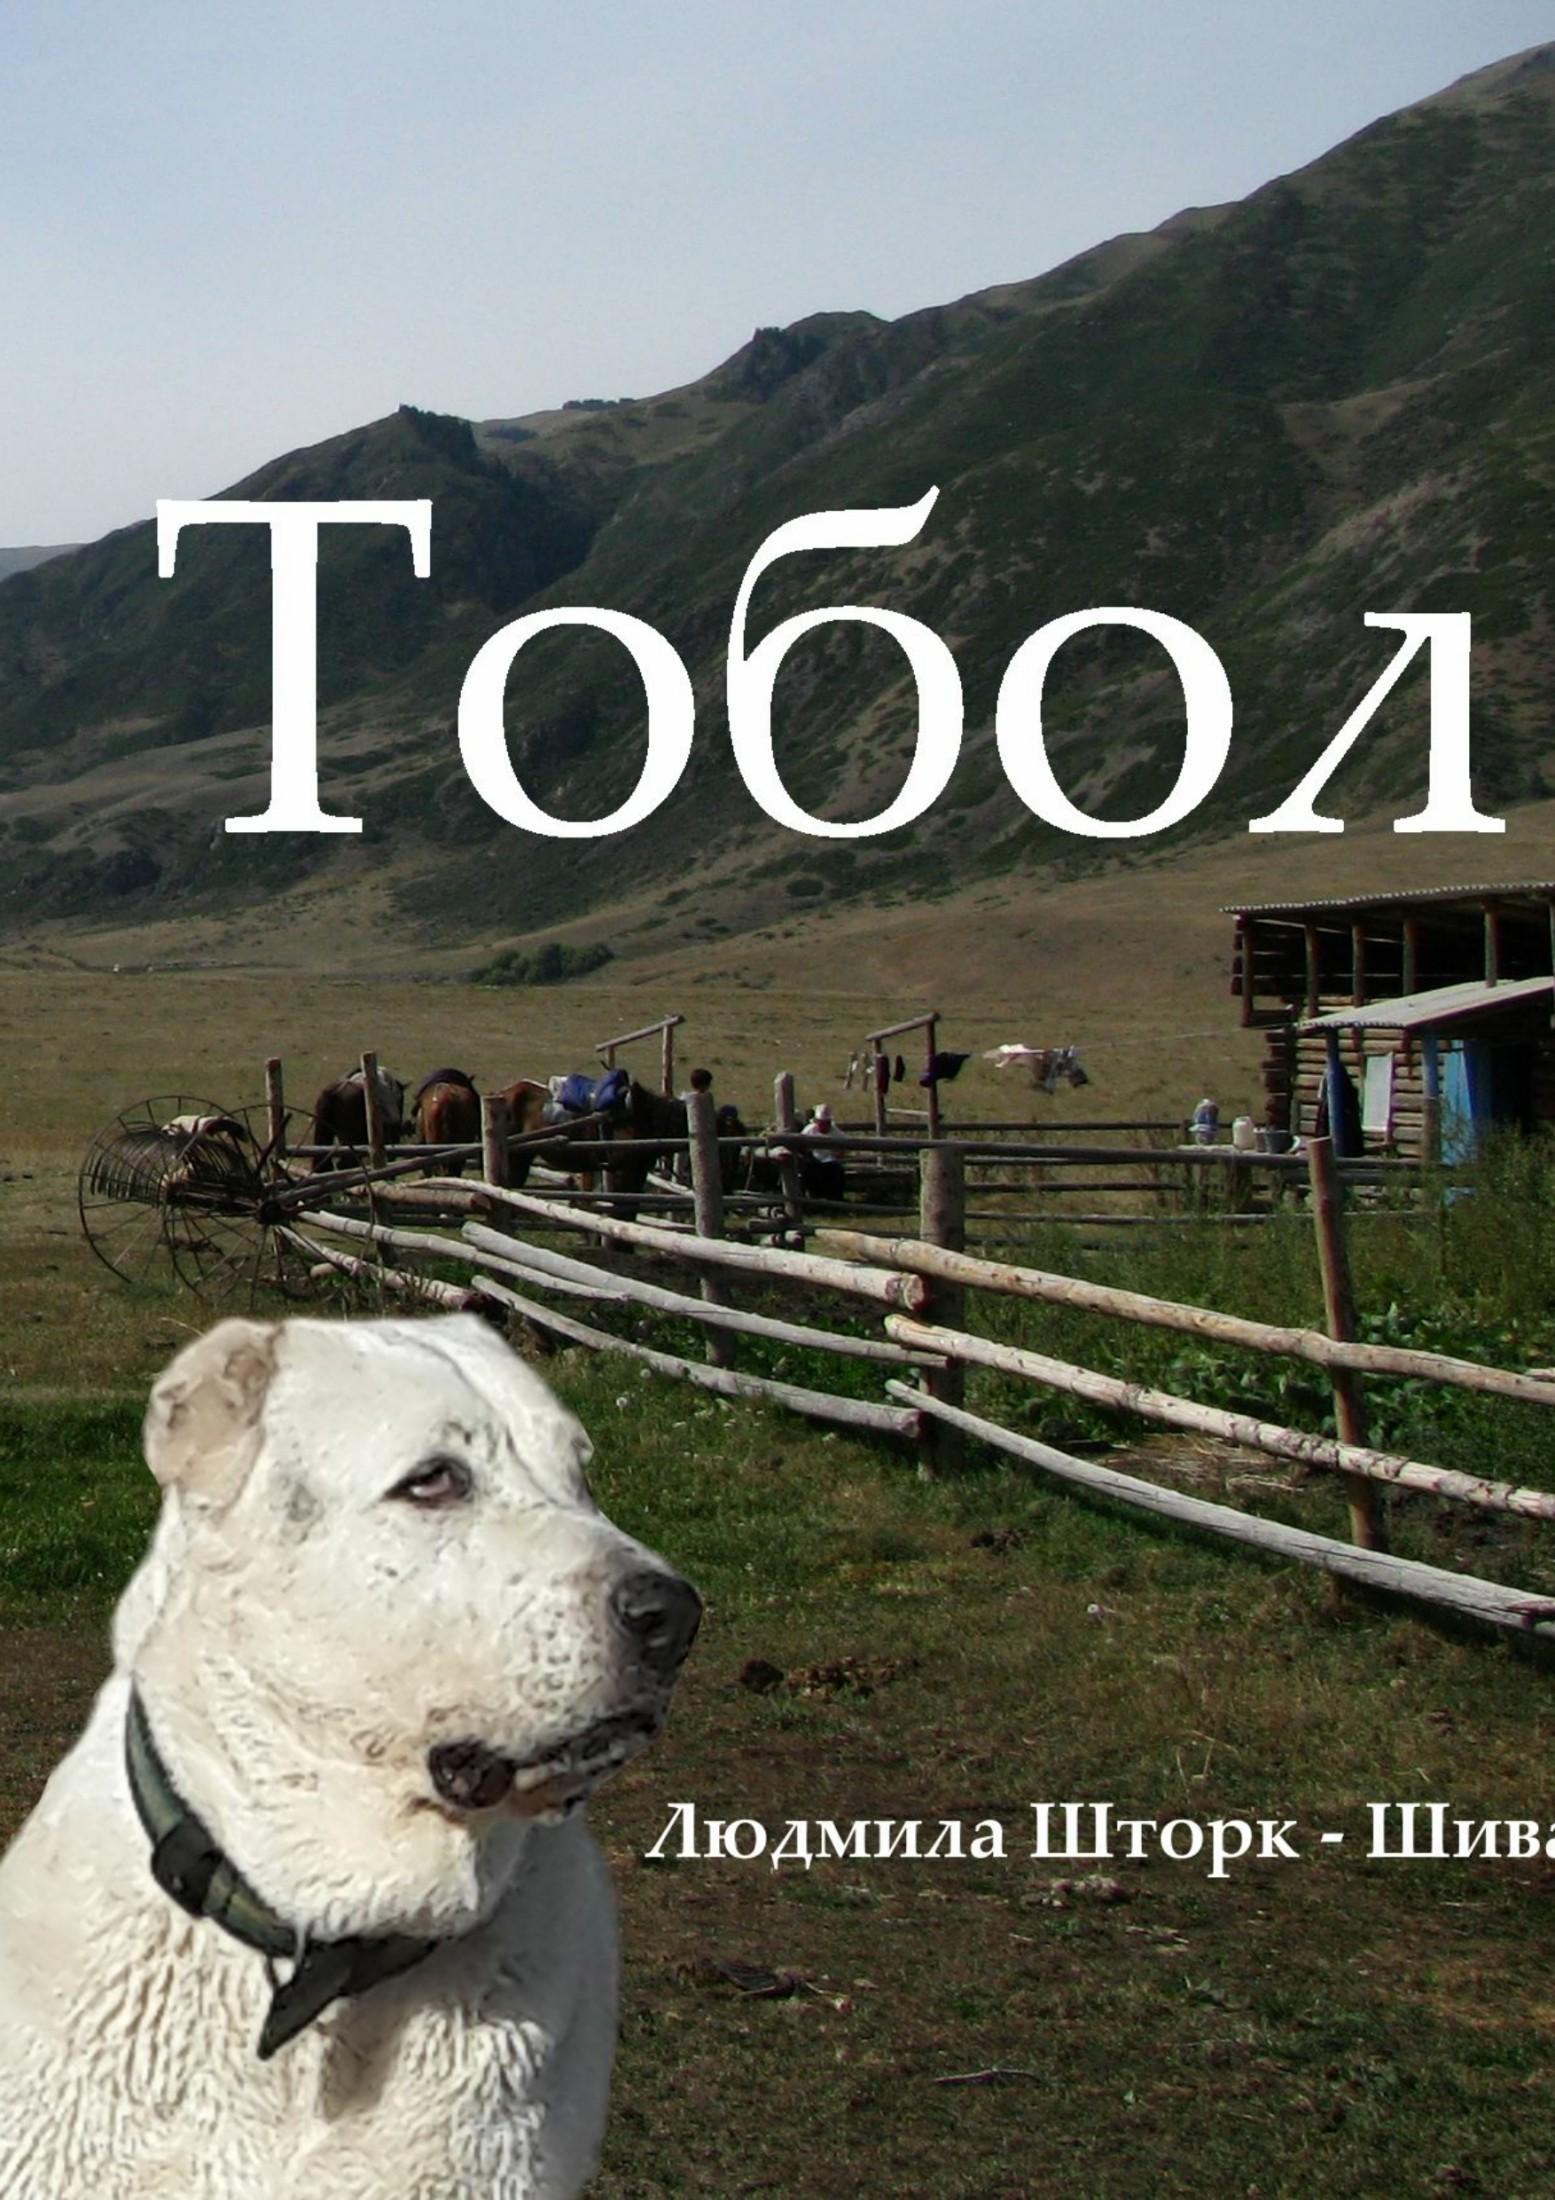 Людмила Шторк-Шива - Тобол